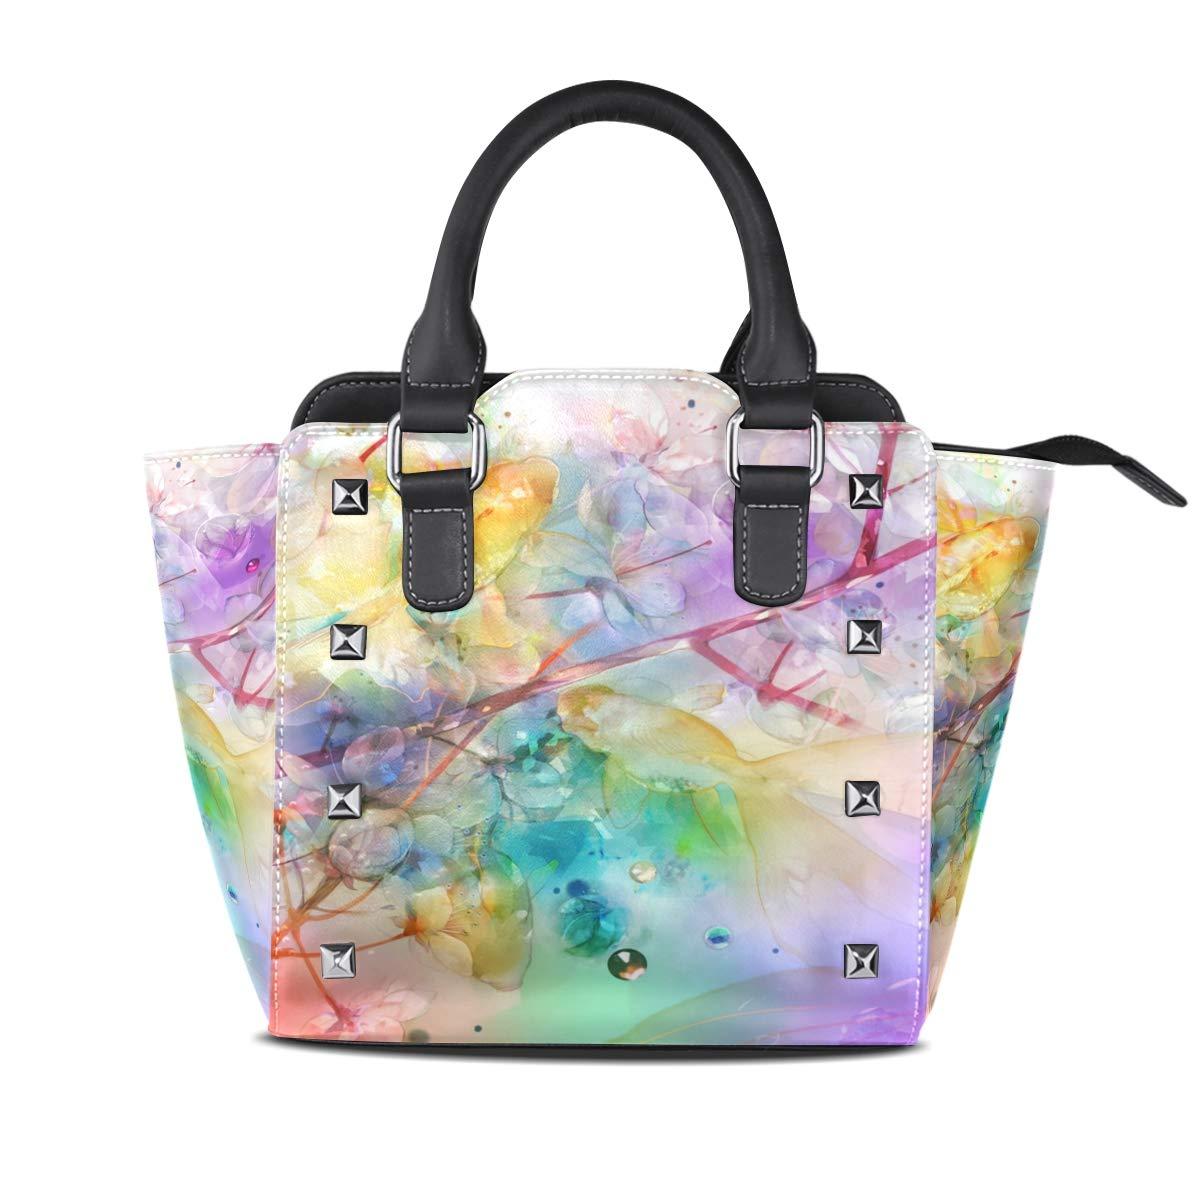 Design1 Handbag Coloful Halo Flower Carp Genuine Leather Tote Rivet Bag Shoulder Strap Top Handle Women